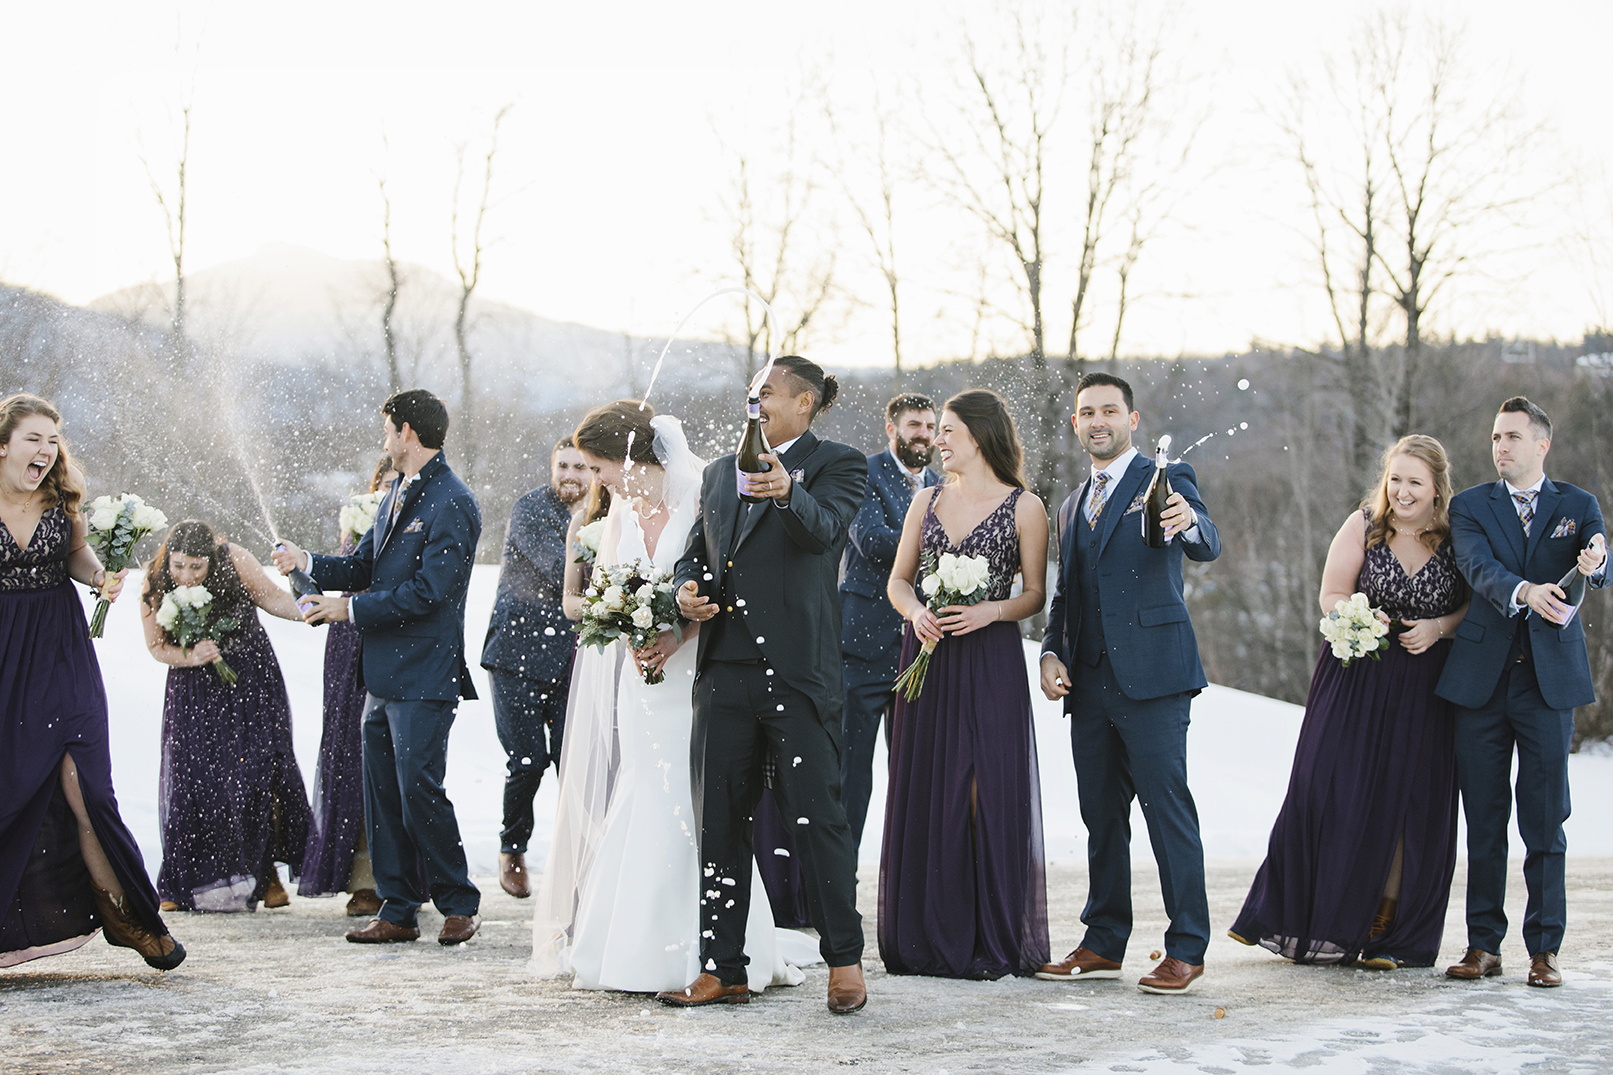 wedding champagne pop.jpg